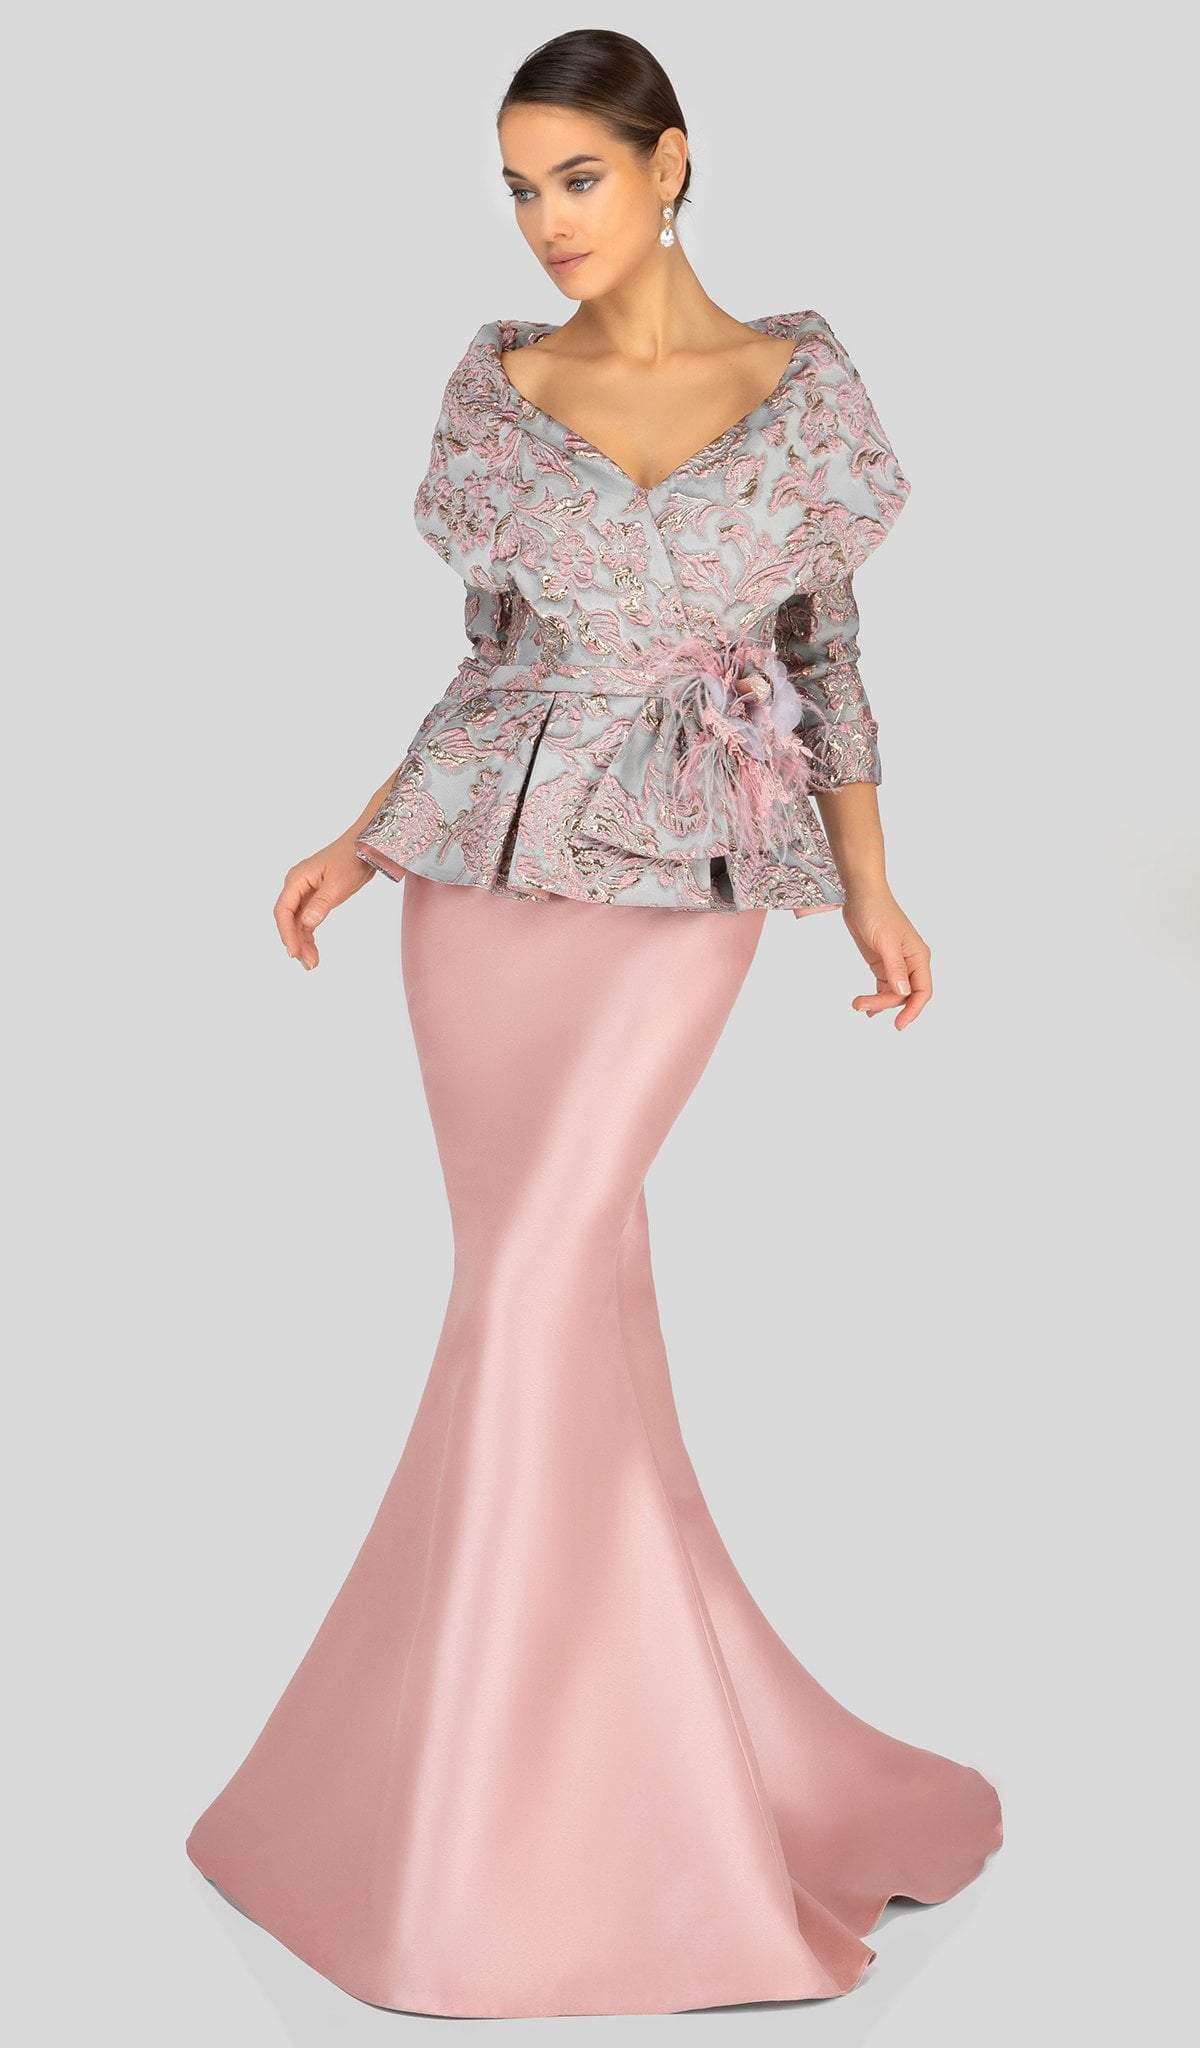 Terani Couture - 1911M9322 Embossed V-Neck Peplum Mermaid Gown